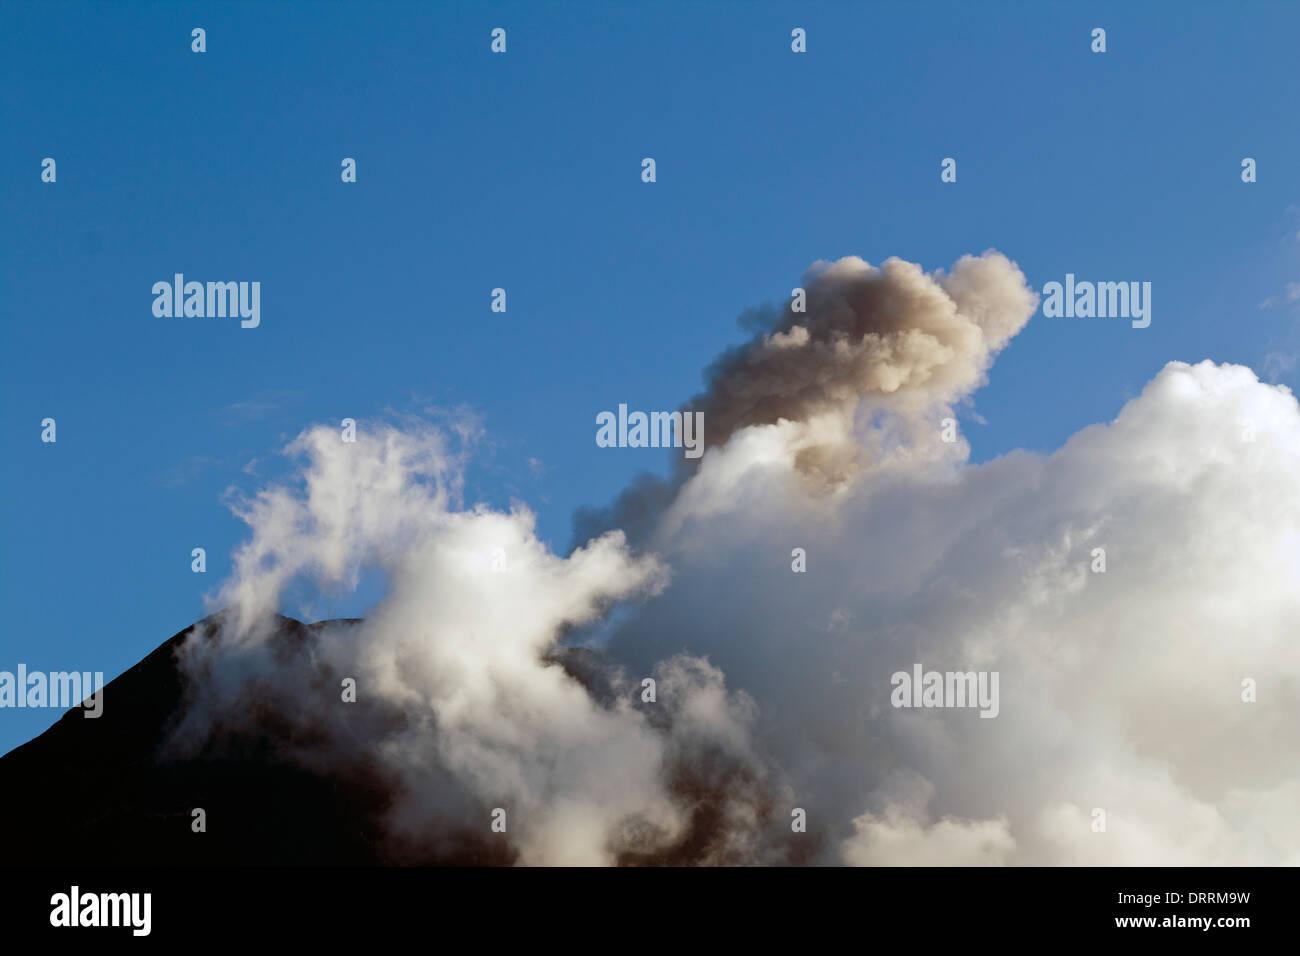 Tungurahua volcano, Ecuador, erupting a small cloud of ash - Stock Image